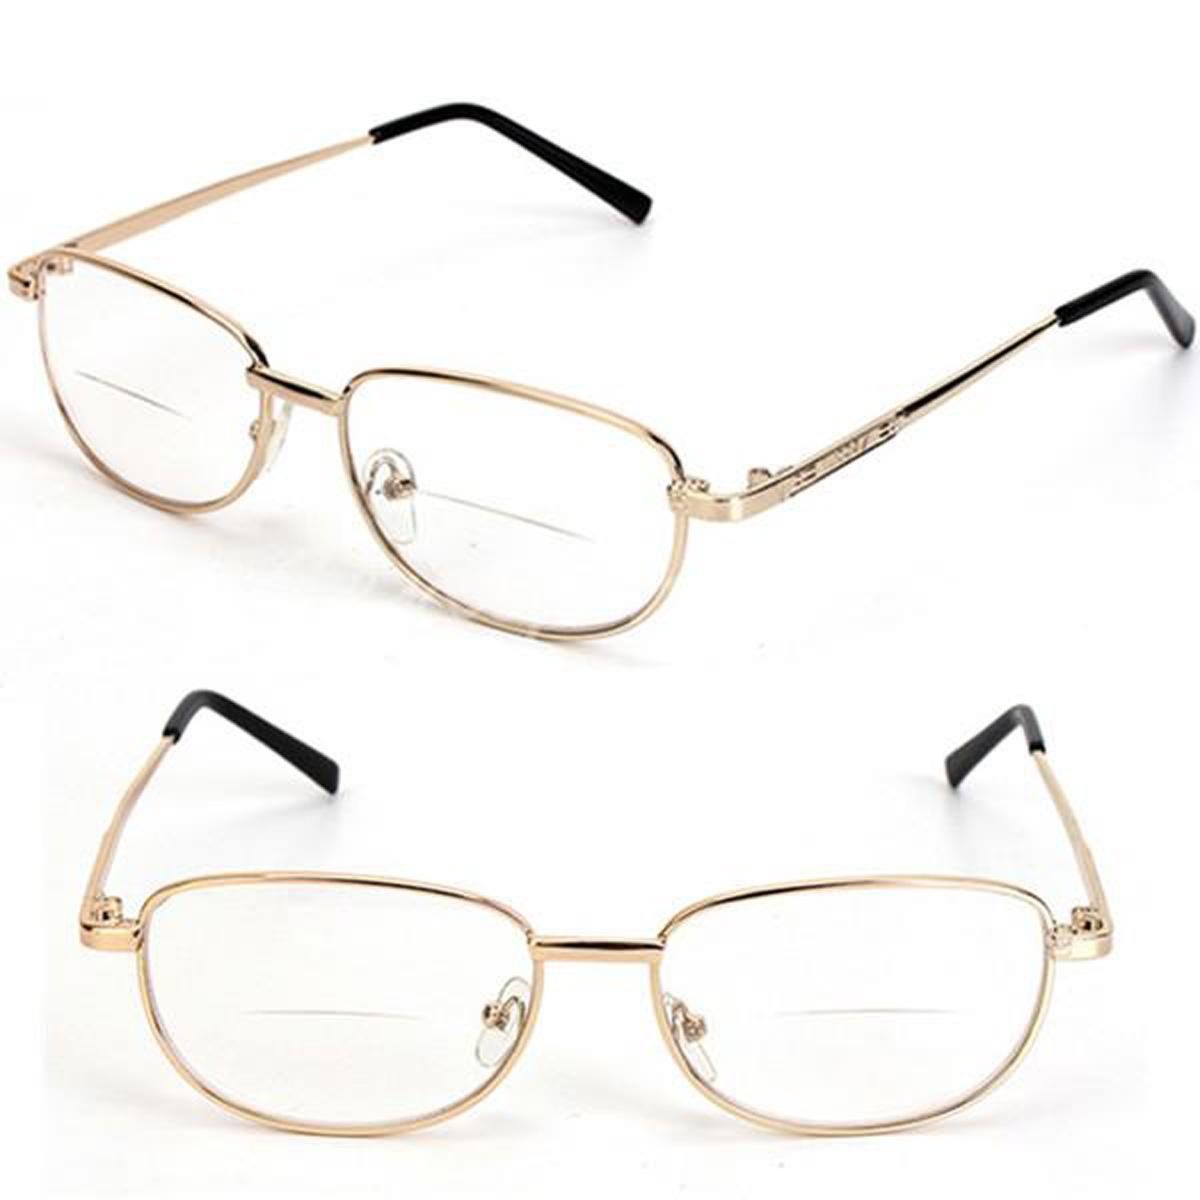 eyeglasses fashion dw86  Fashion-Bifocal-Lens-Rimmed-Men-039-s-Reading